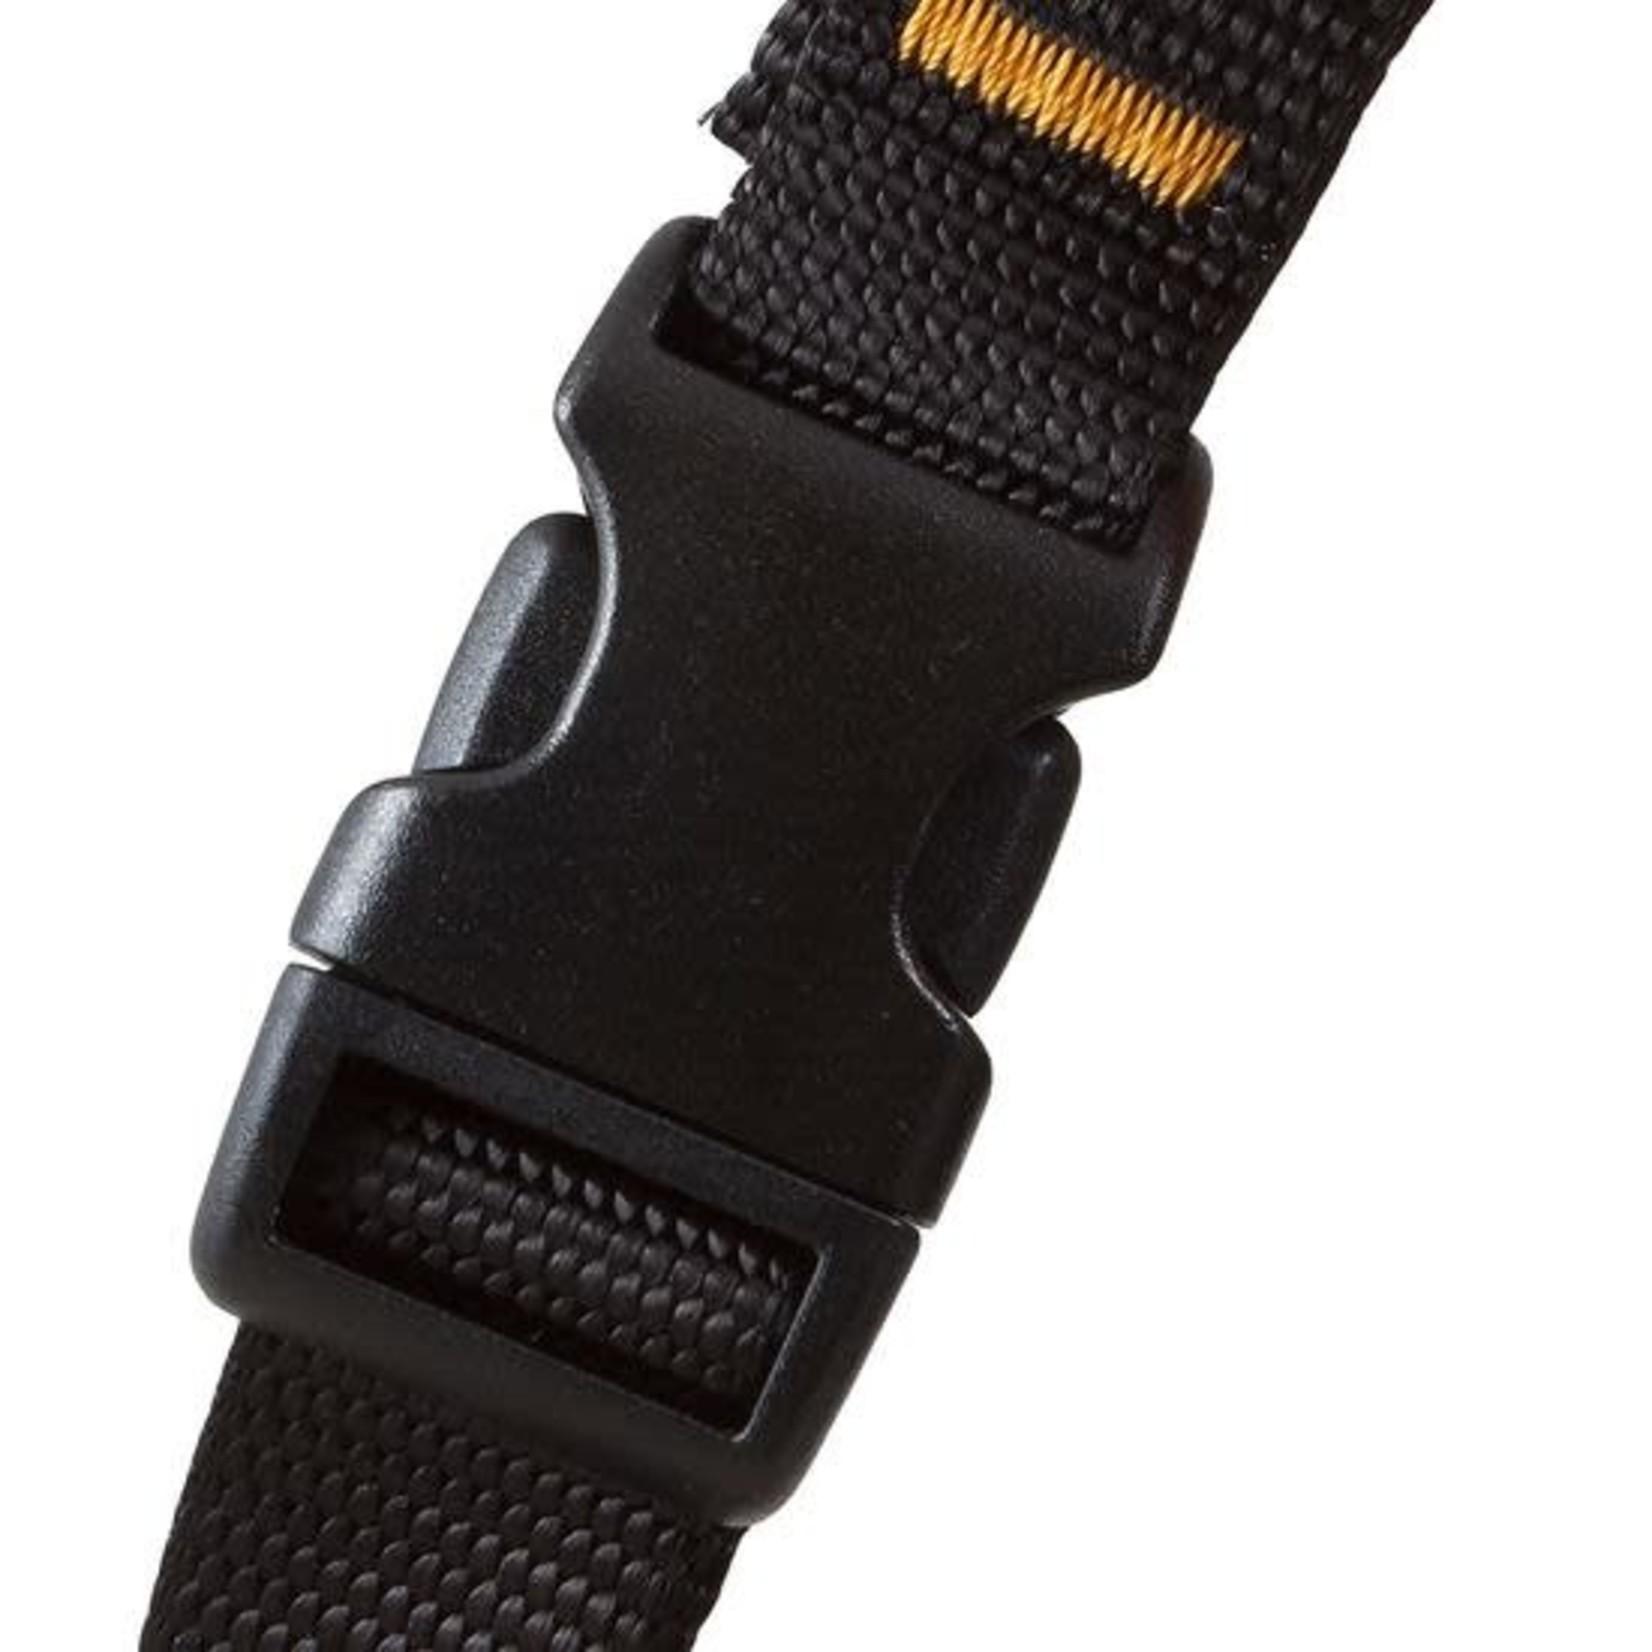 Kurgo Kurgo Harness Tru-Fit Smart Black